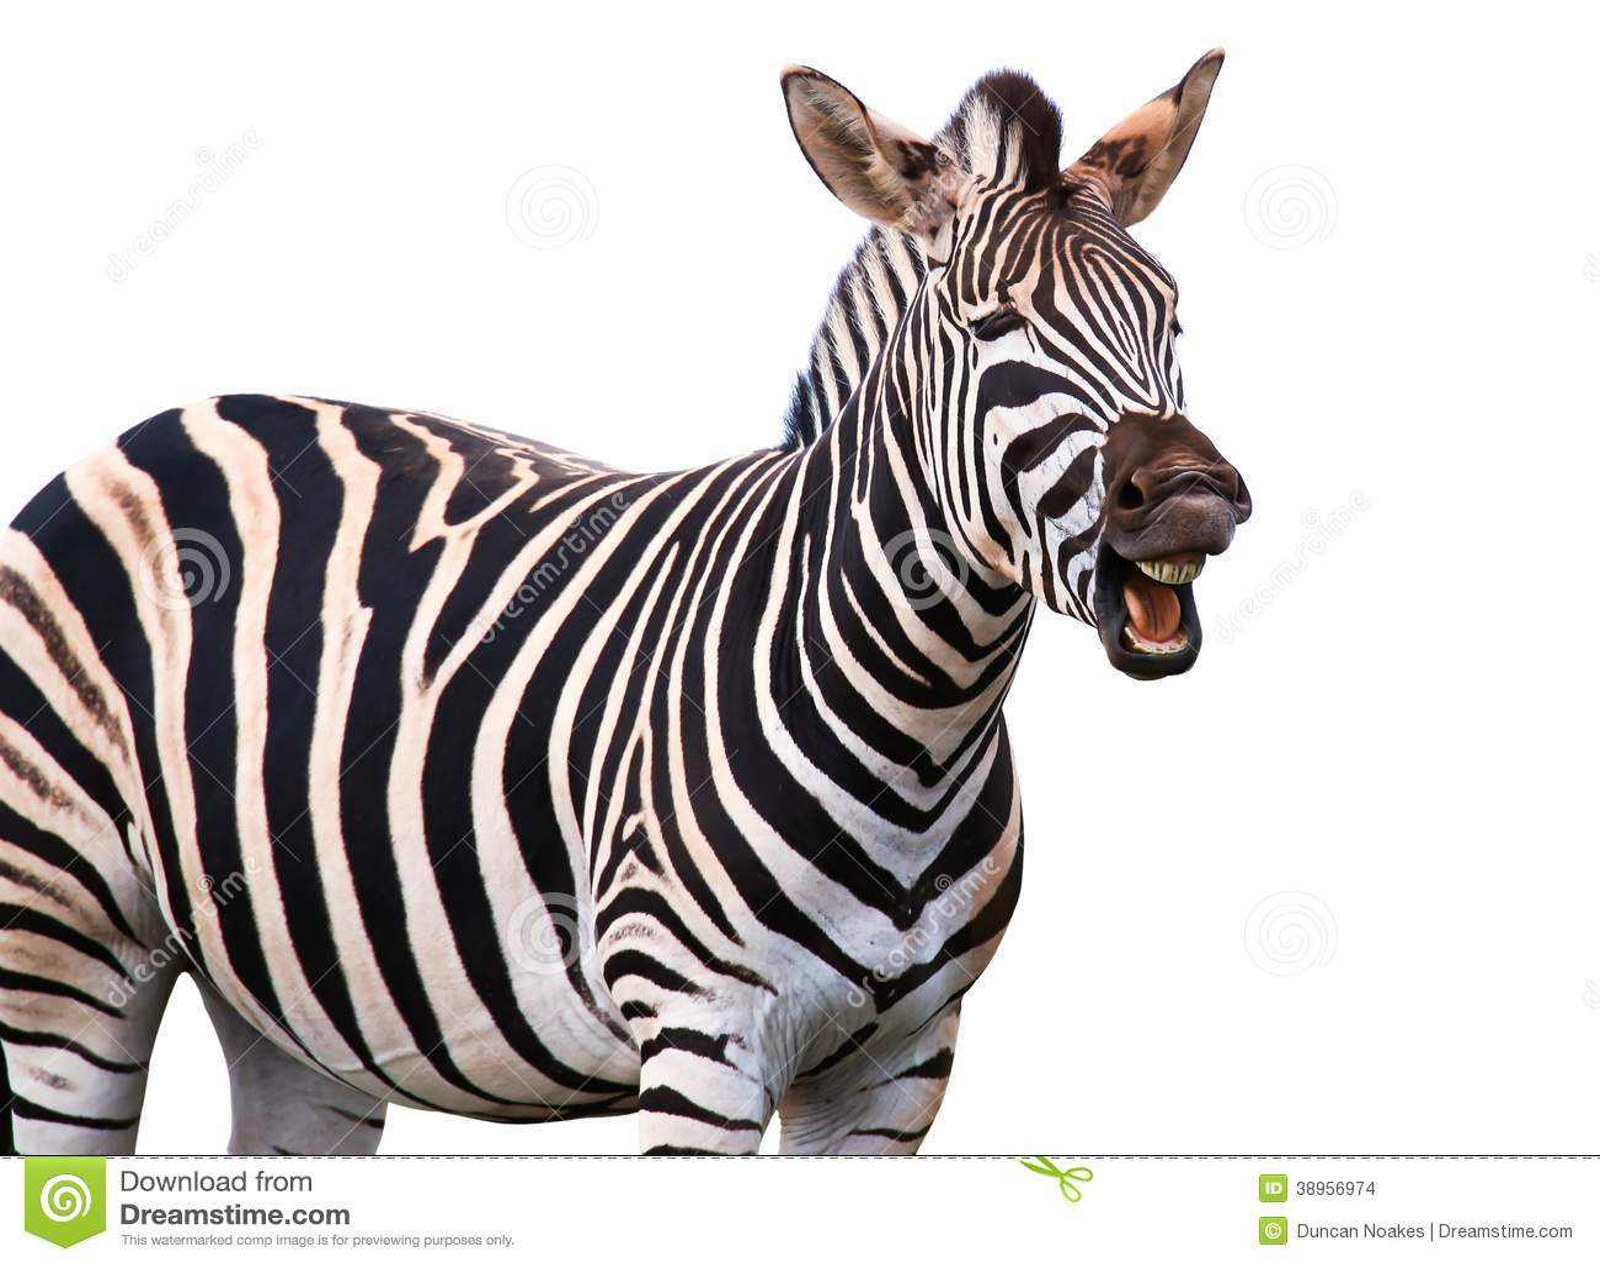 shouting or laughing zebra stock photo image 38956974. Black Bedroom Furniture Sets. Home Design Ideas